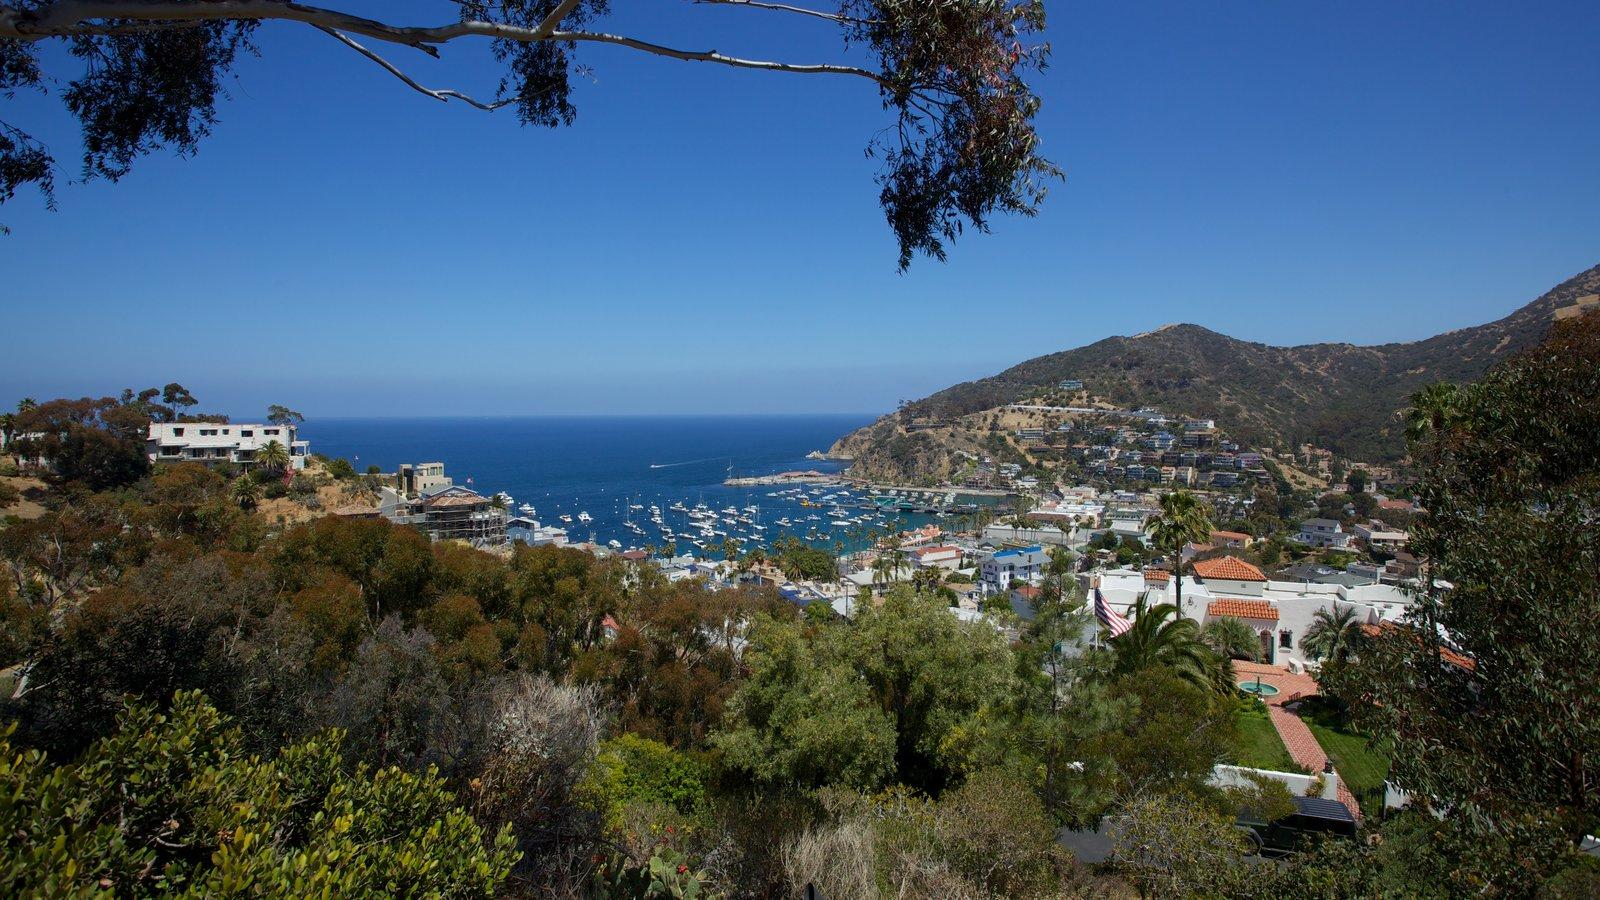 Los Angeles showing general coastal views, a bay or harbor and landscape views